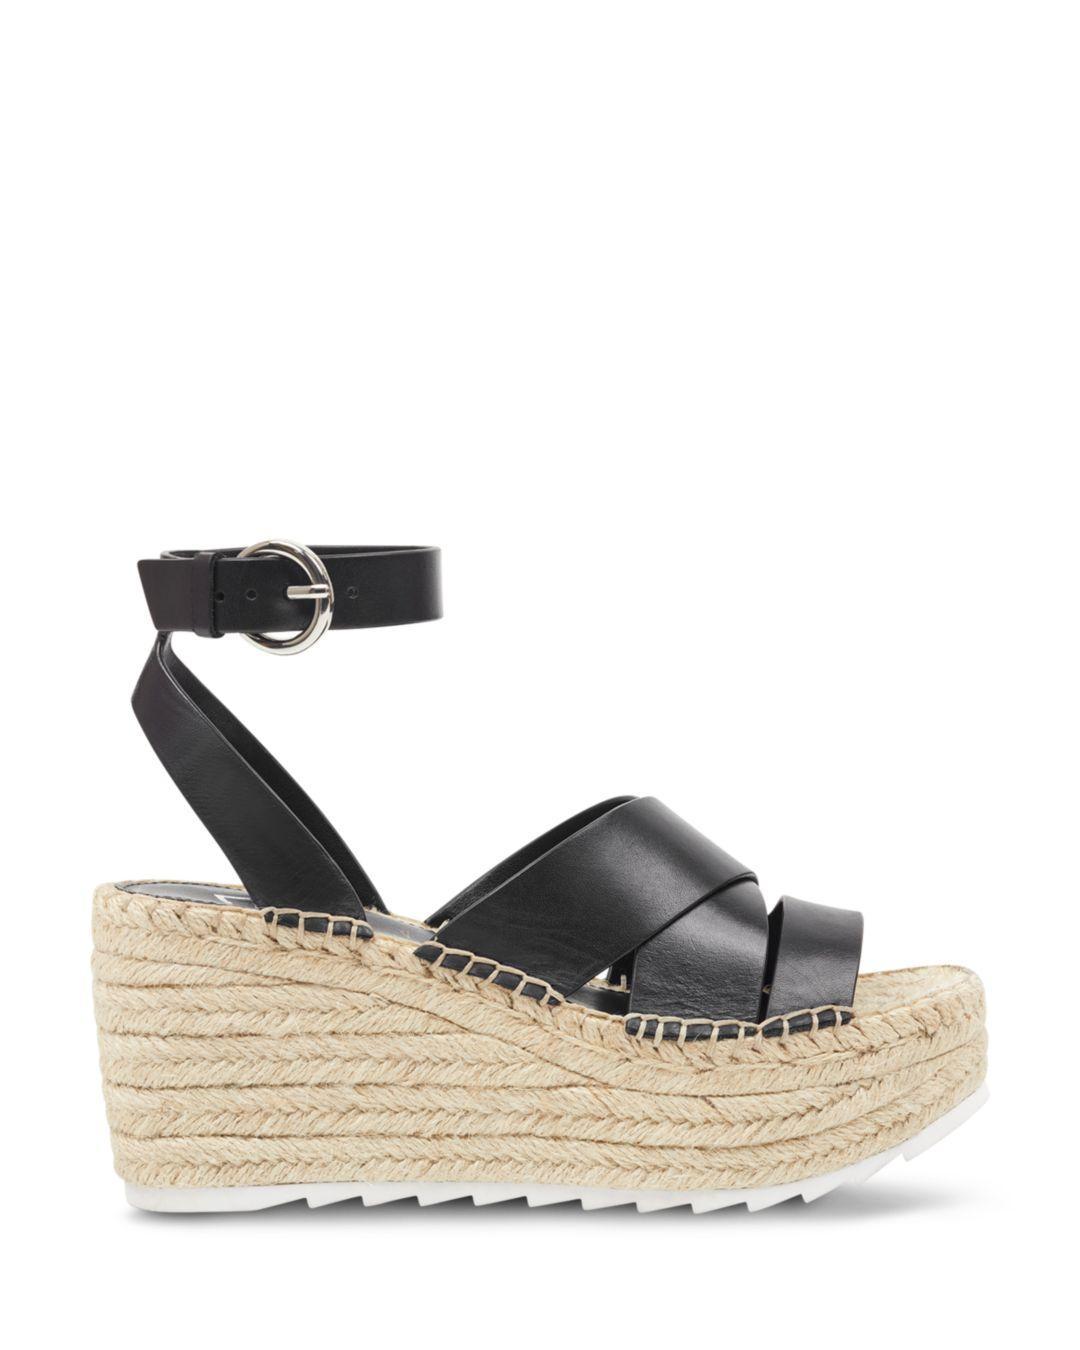 7bb6591c816f Lyst - Marc Fisher Women s Raffa Espadrille Platform Wedge Sandals in Black